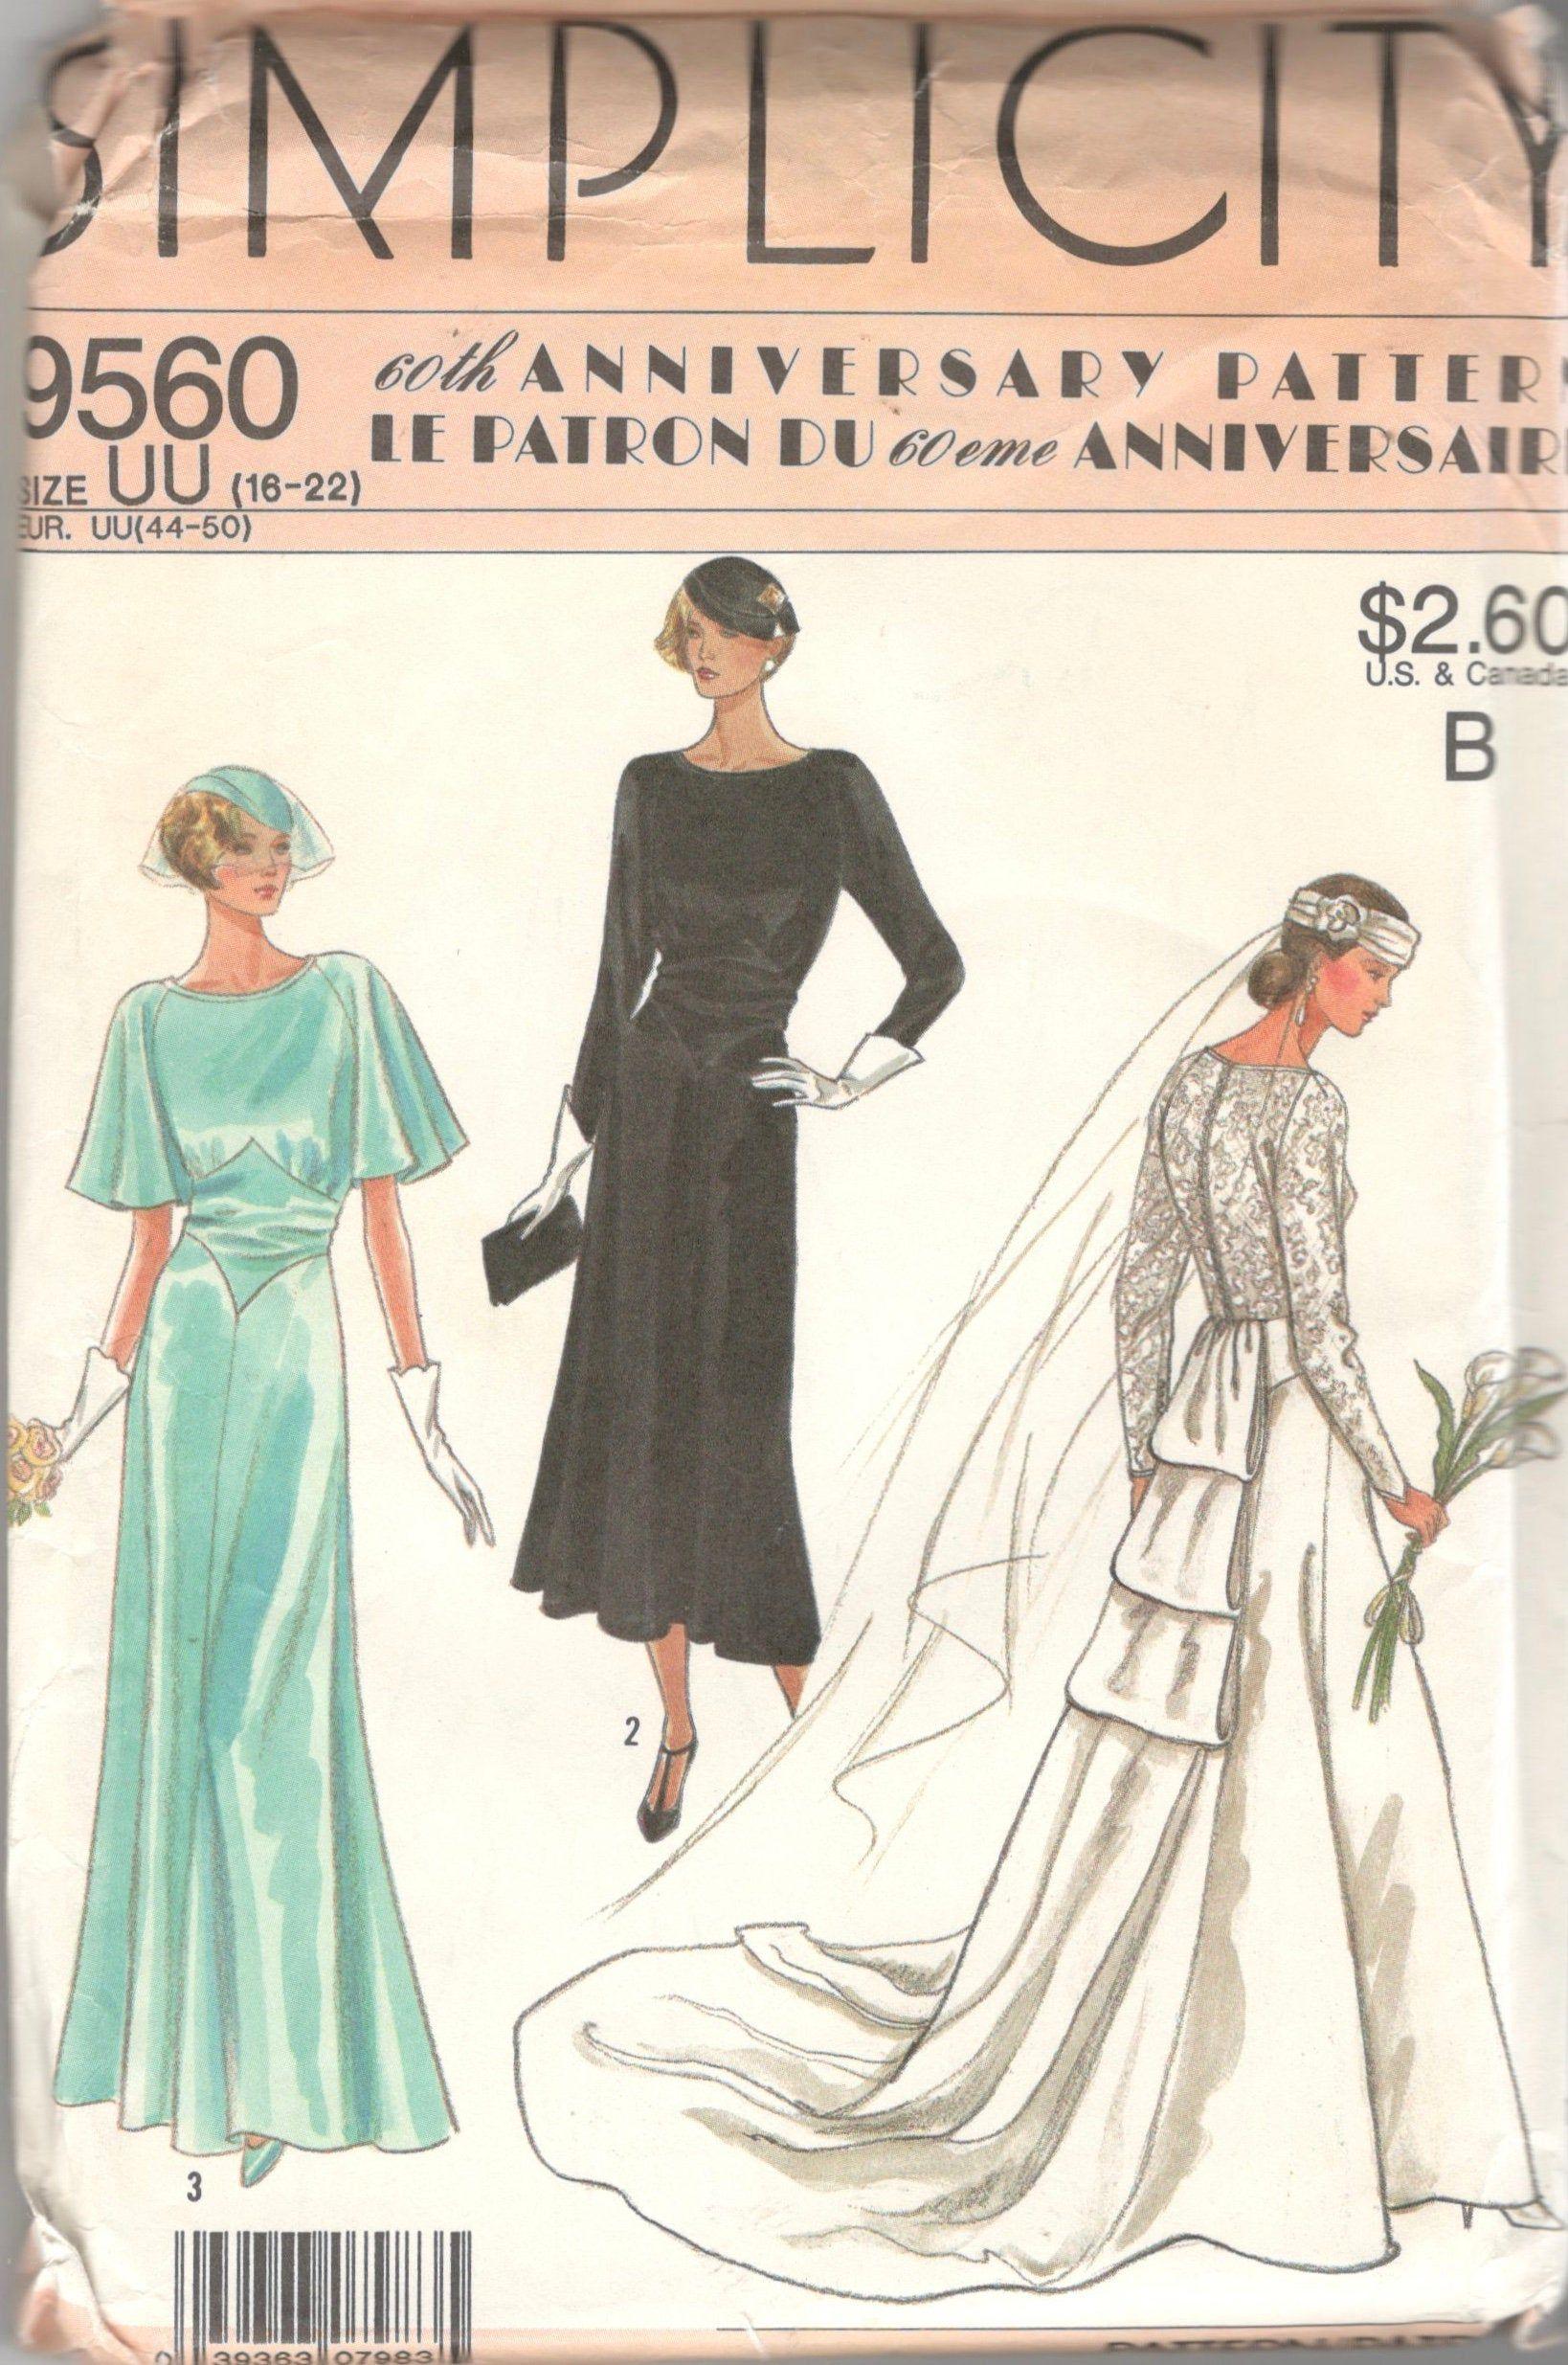 Simplicity 9560 1920s Brides Wedding Gown Pattern Shaped Etsy Vintage Wedding Dress Pattern Wedding Dress Patterns 1920s Wedding Dress [ 2470 x 1638 Pixel ]